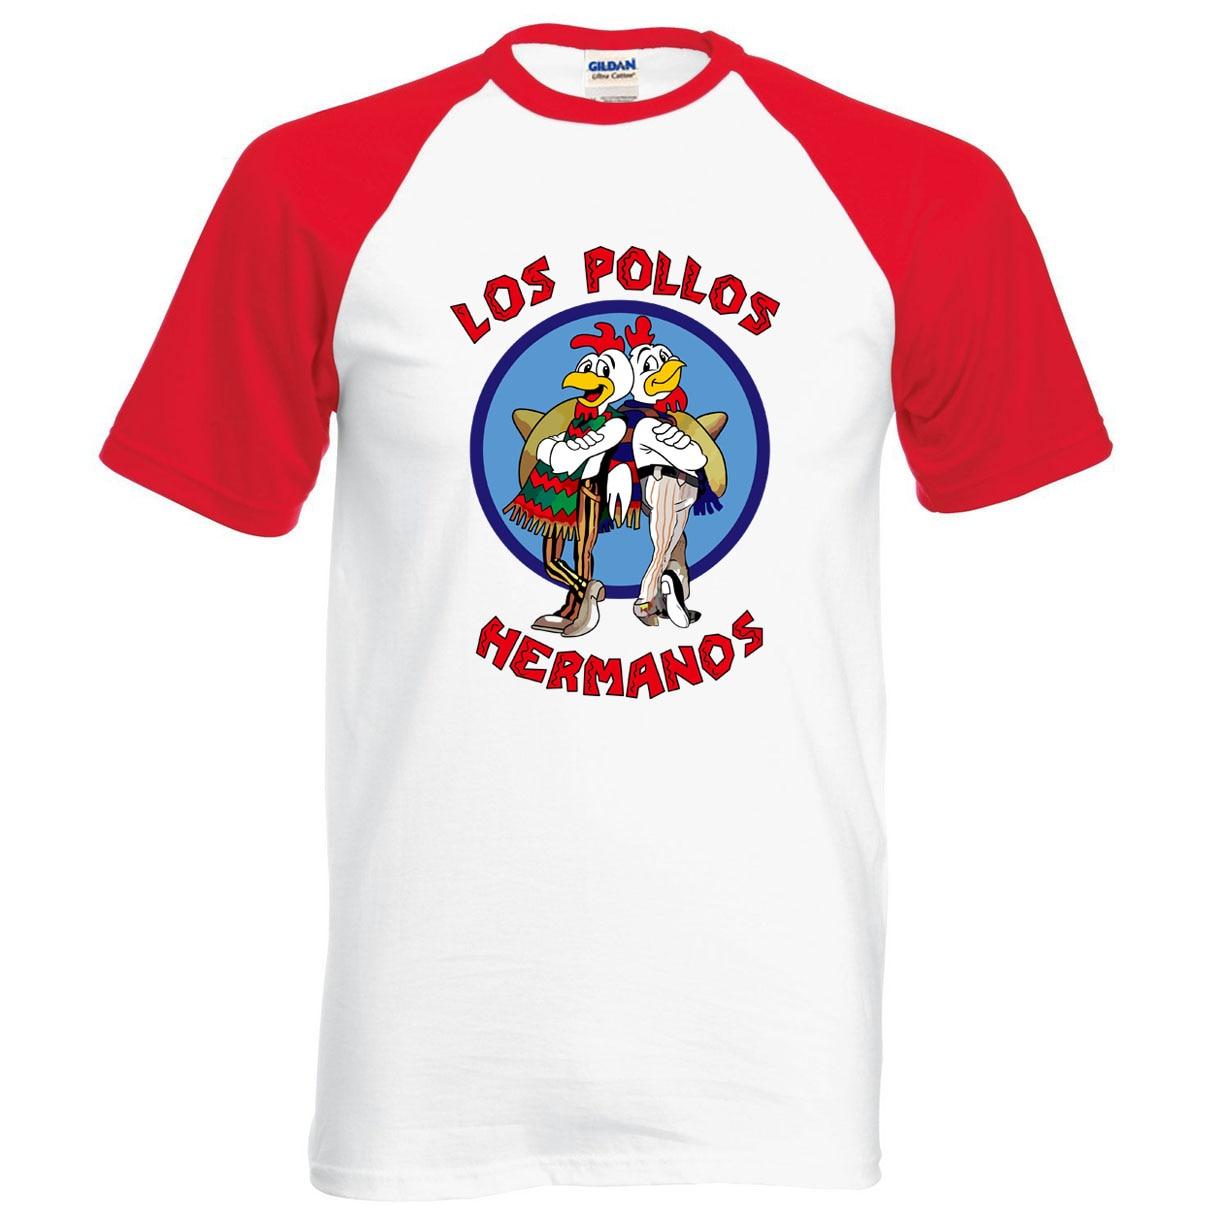 New Arrival Breaking Bad LOS POLLOS Hermanos T Shirt Chicken Brothers 2019 Summer 100% Cotton Cartoon Casual Raglan Tee For Fans